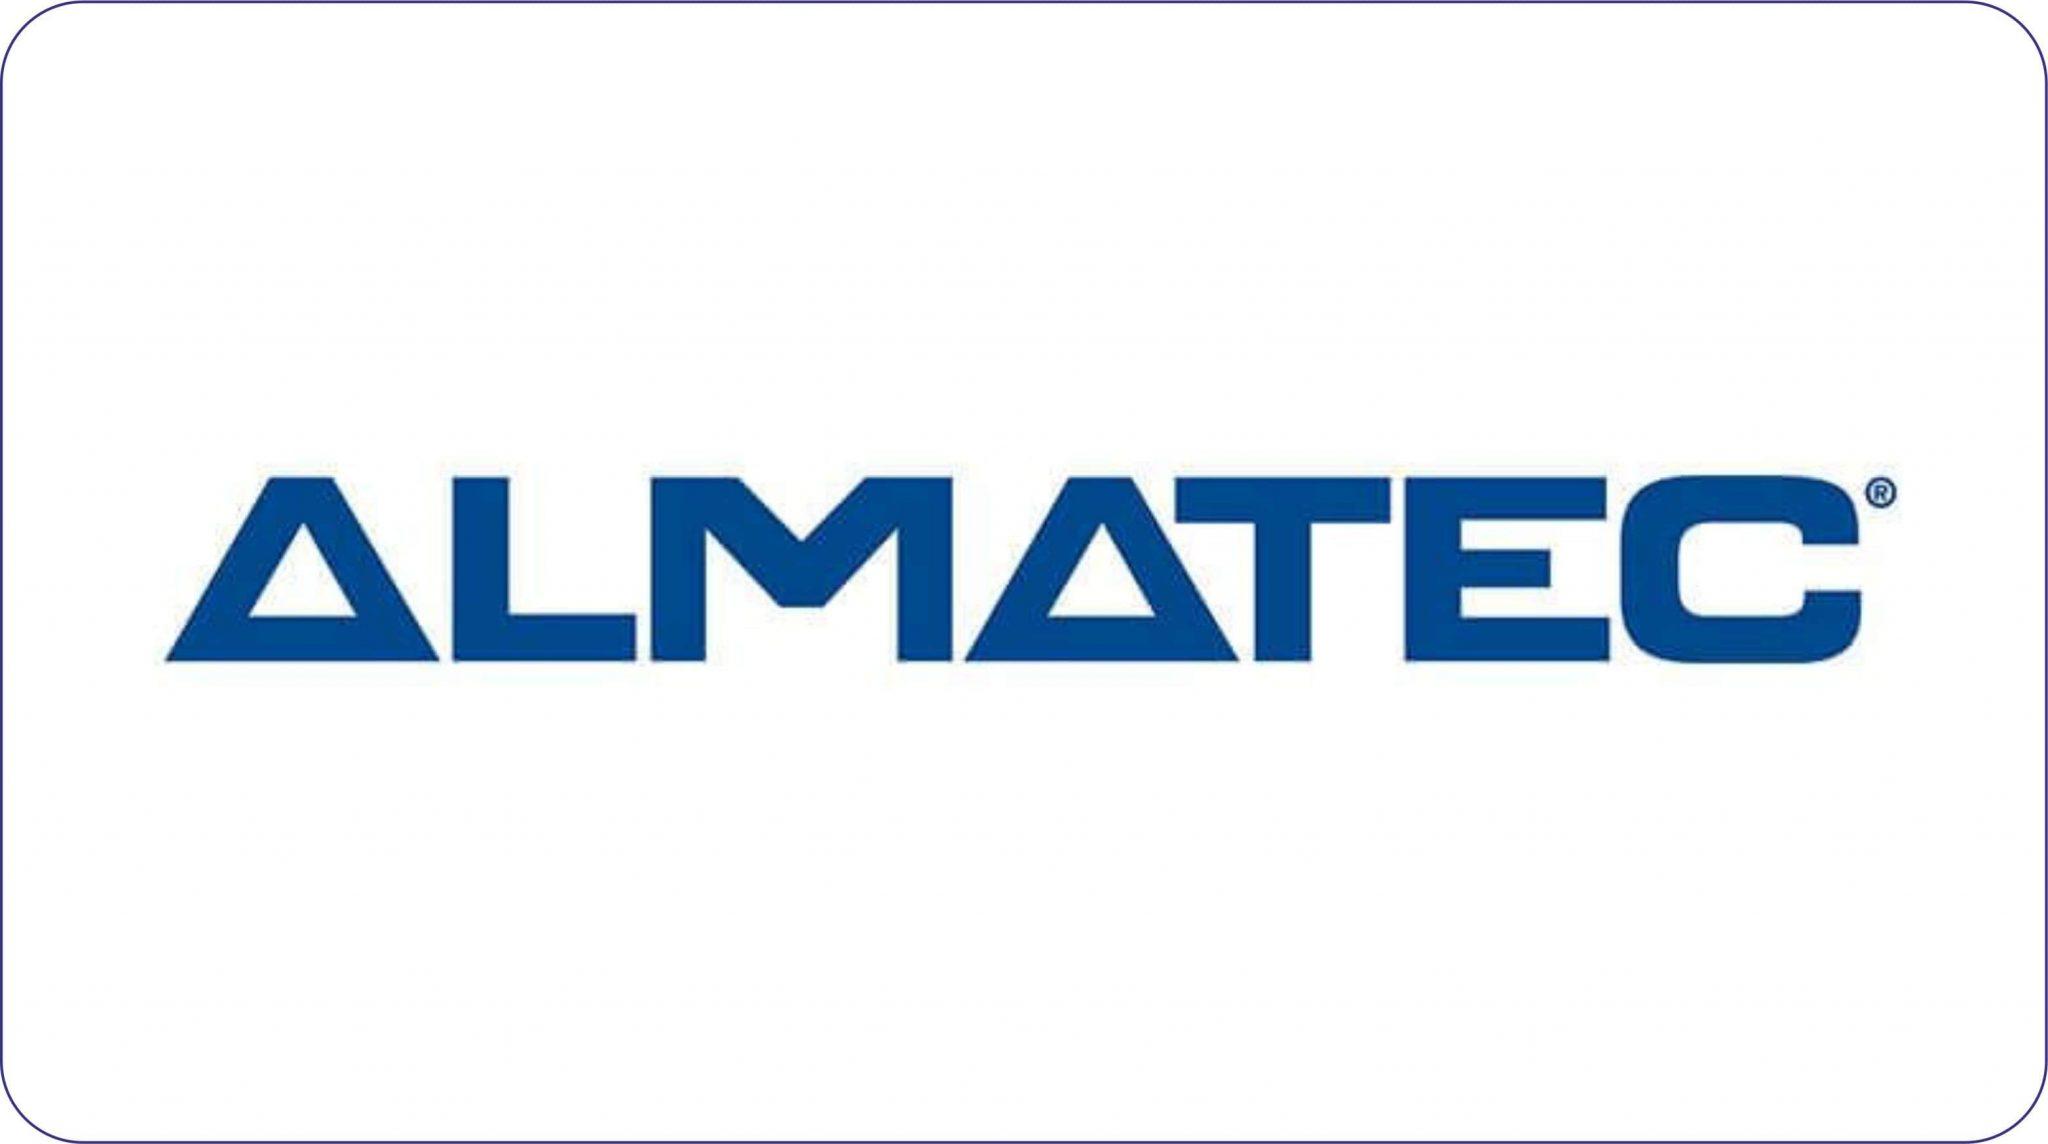 ALMATEC-min